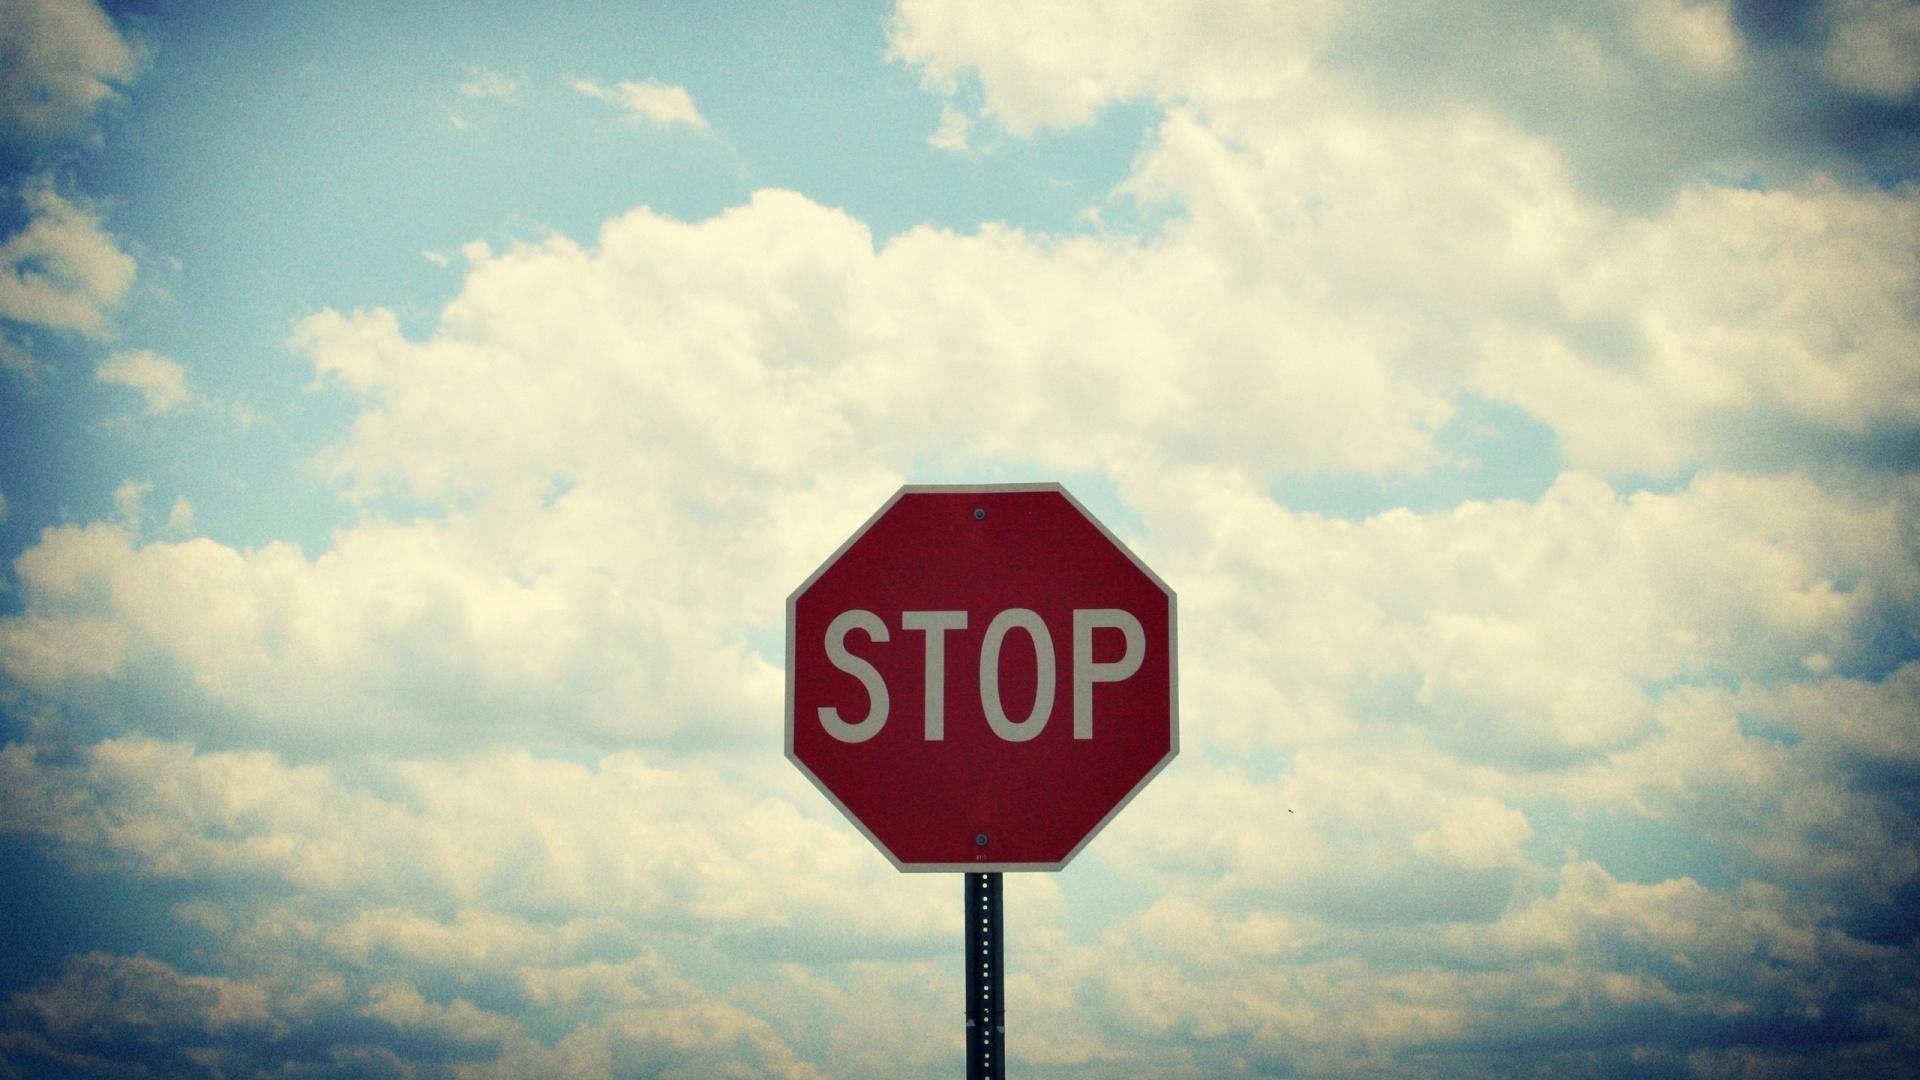 Download Wallpaper 1920x1080 Sign, Road, Stop, Sky, Clouds